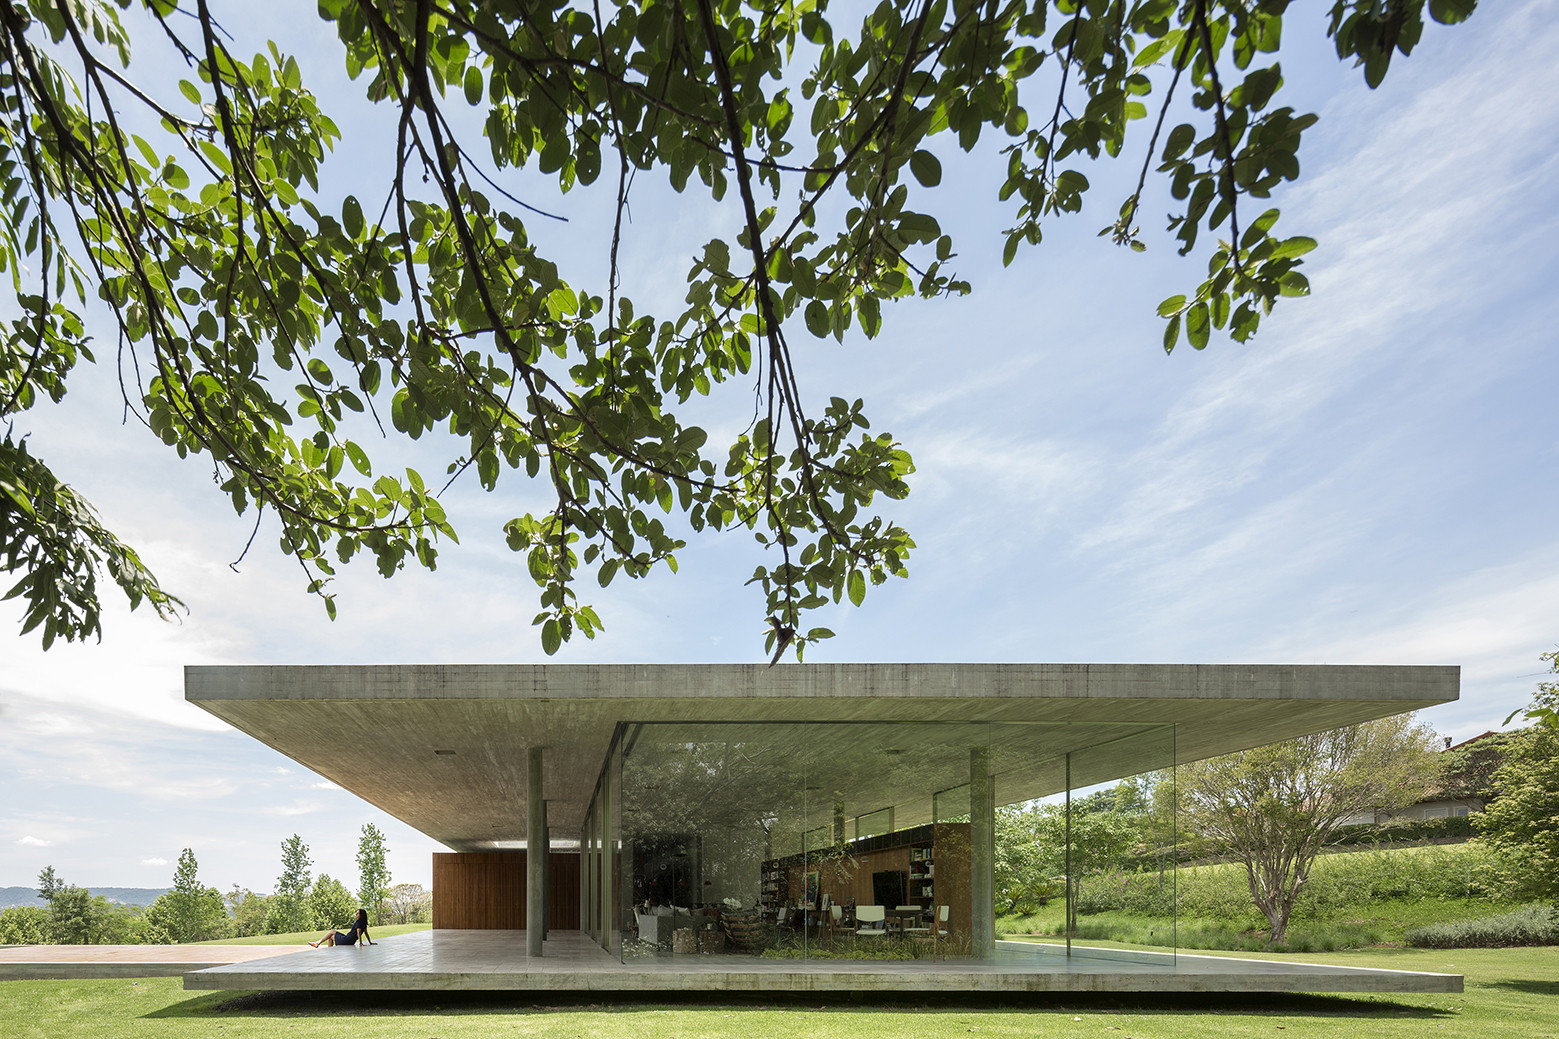 Casa Redux / Studio MK27 - Marcio Kogan + Samanta Cafardo